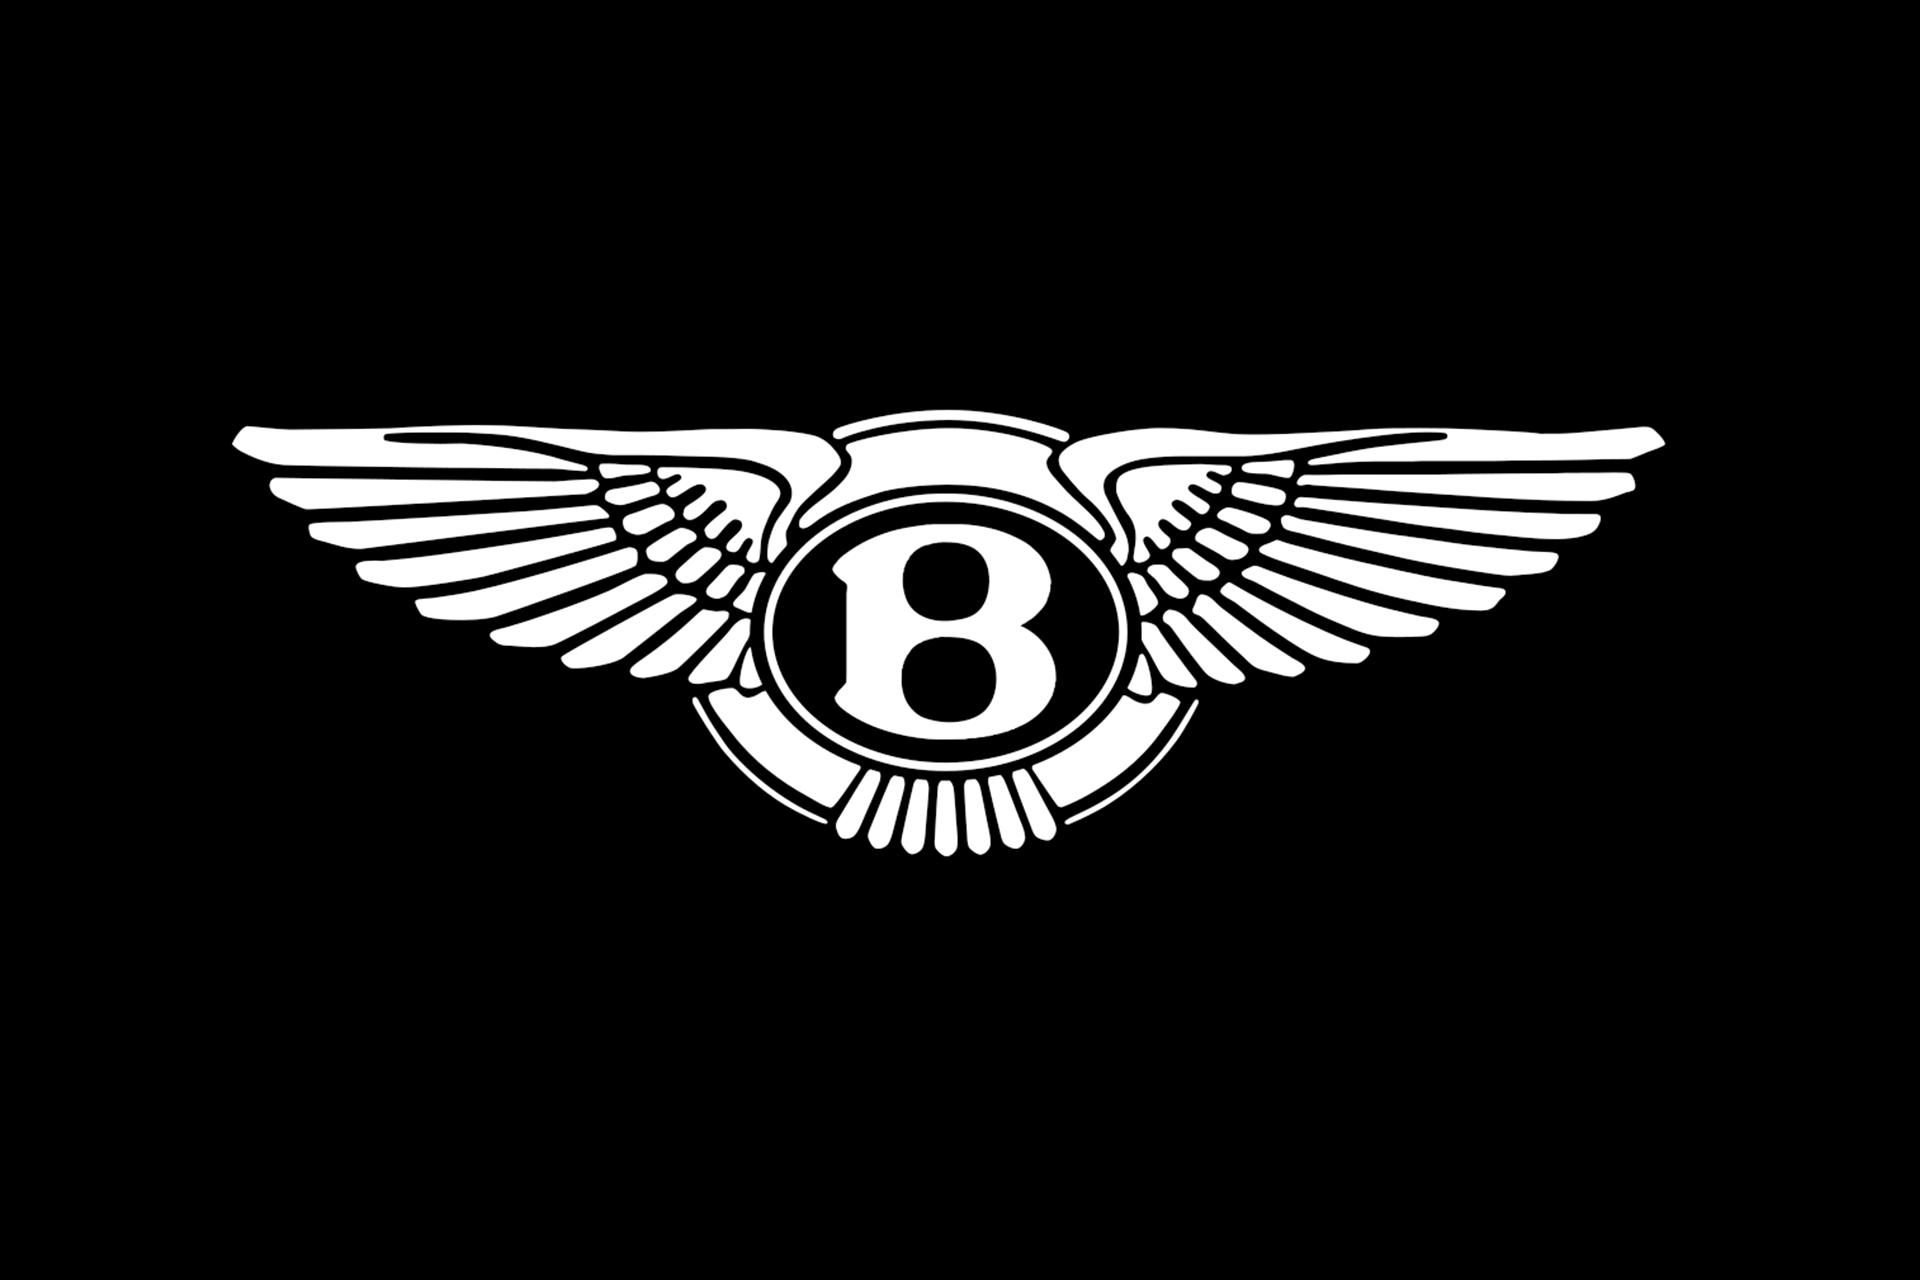 bentley referenz jentner metallveredelung logo sw